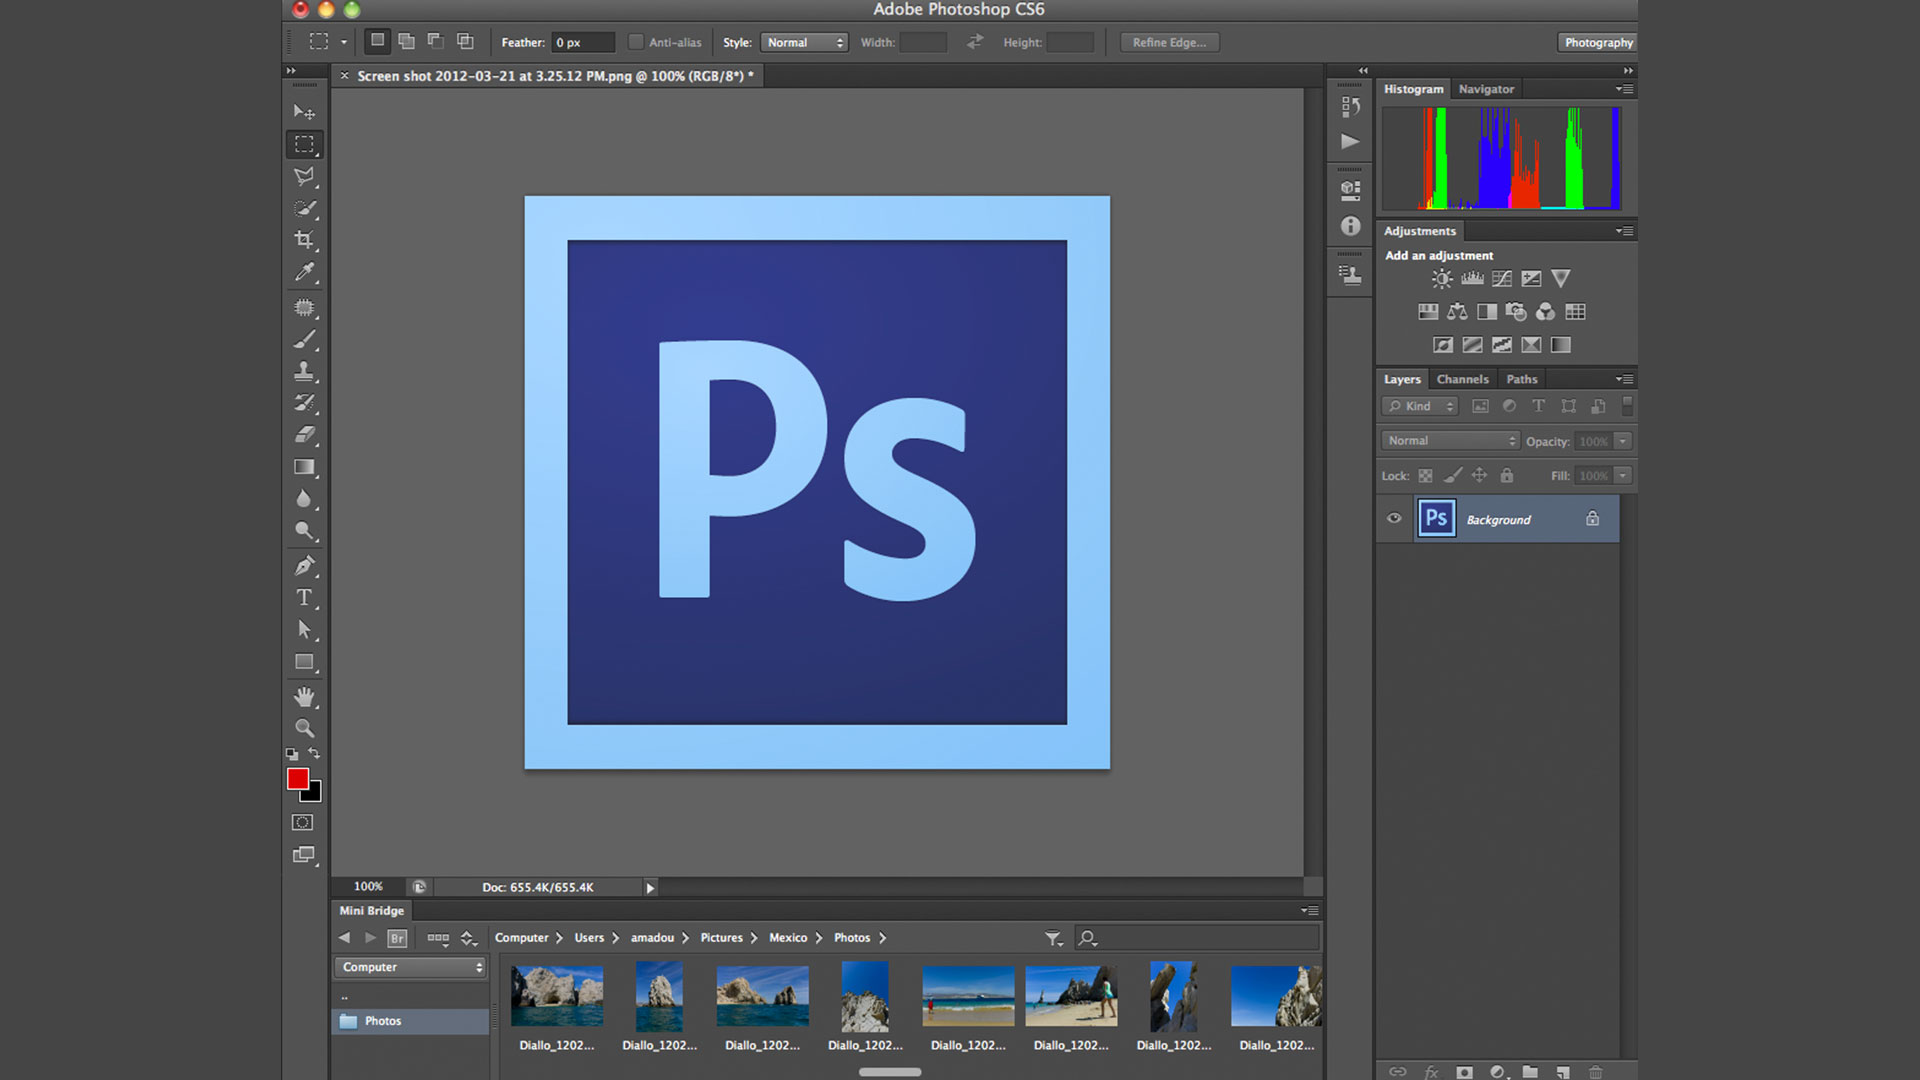 Adobe Photoshop CS6 One on One Fundamentals